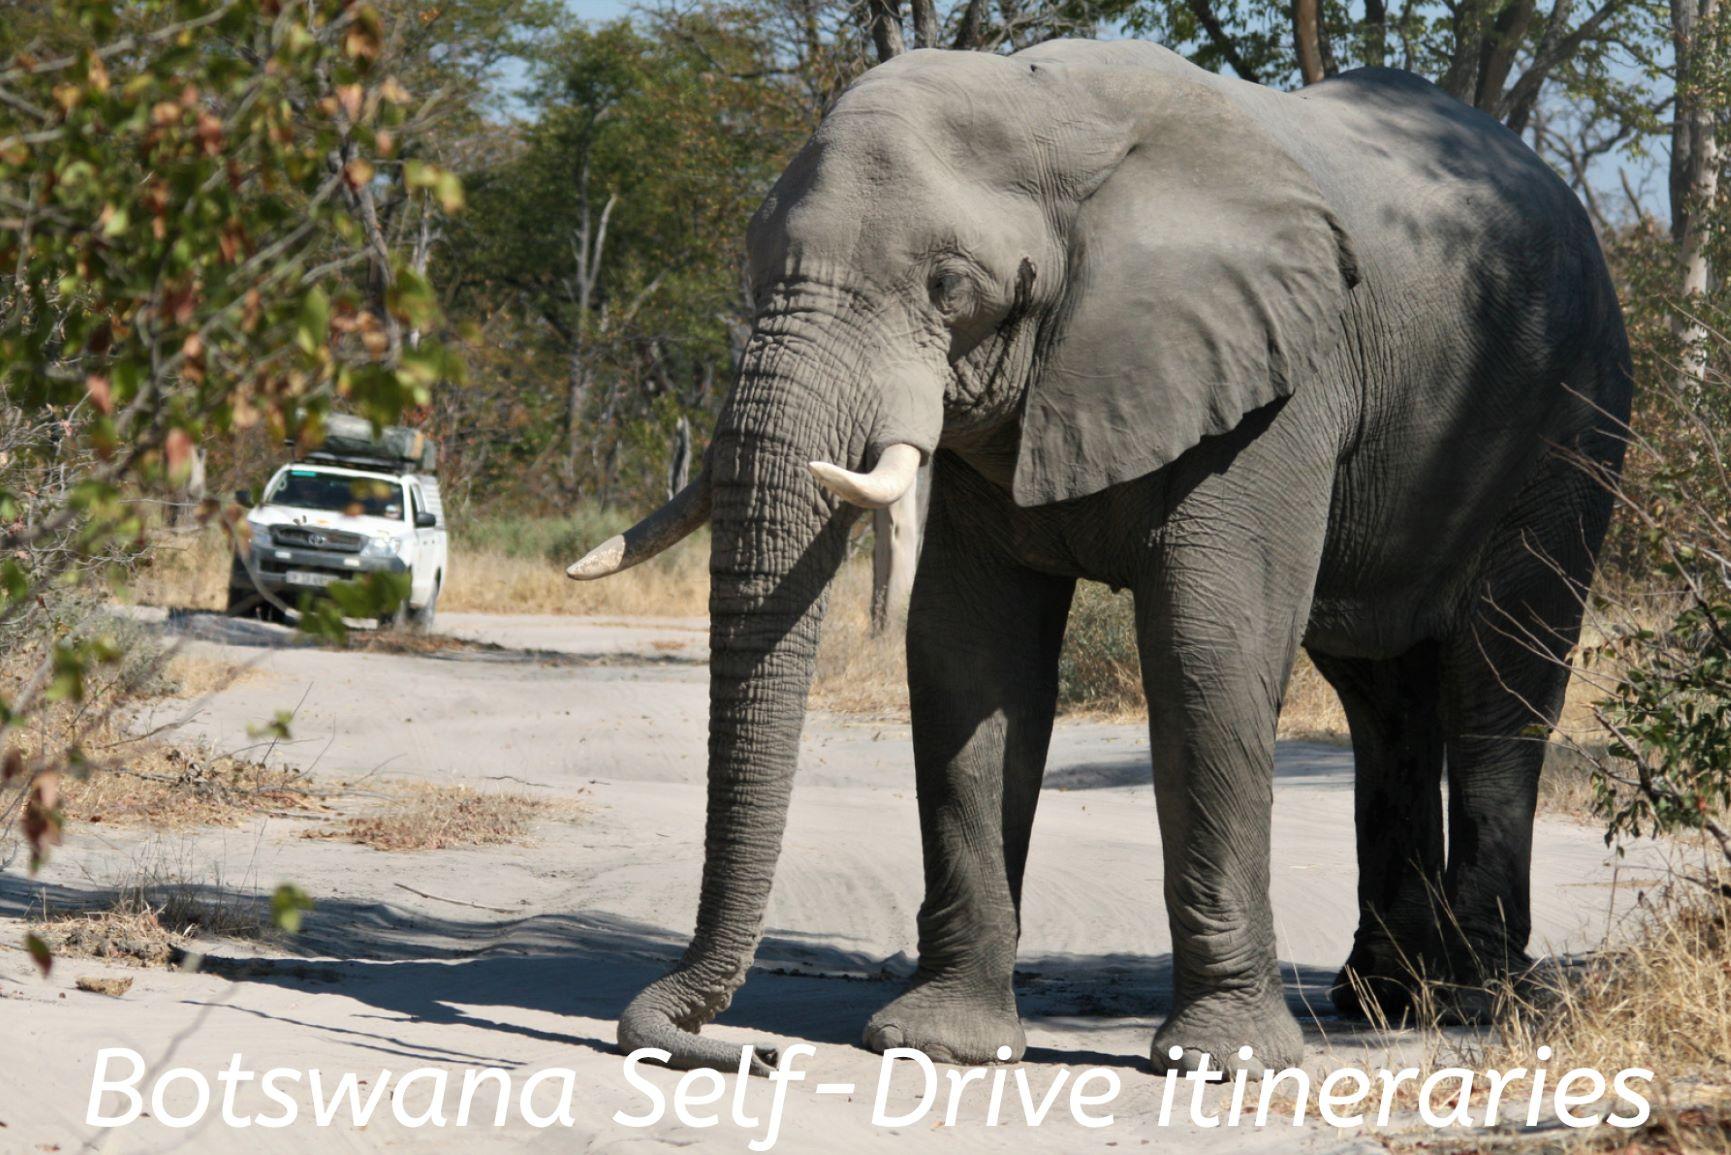 Botswana Self Drive itineraries